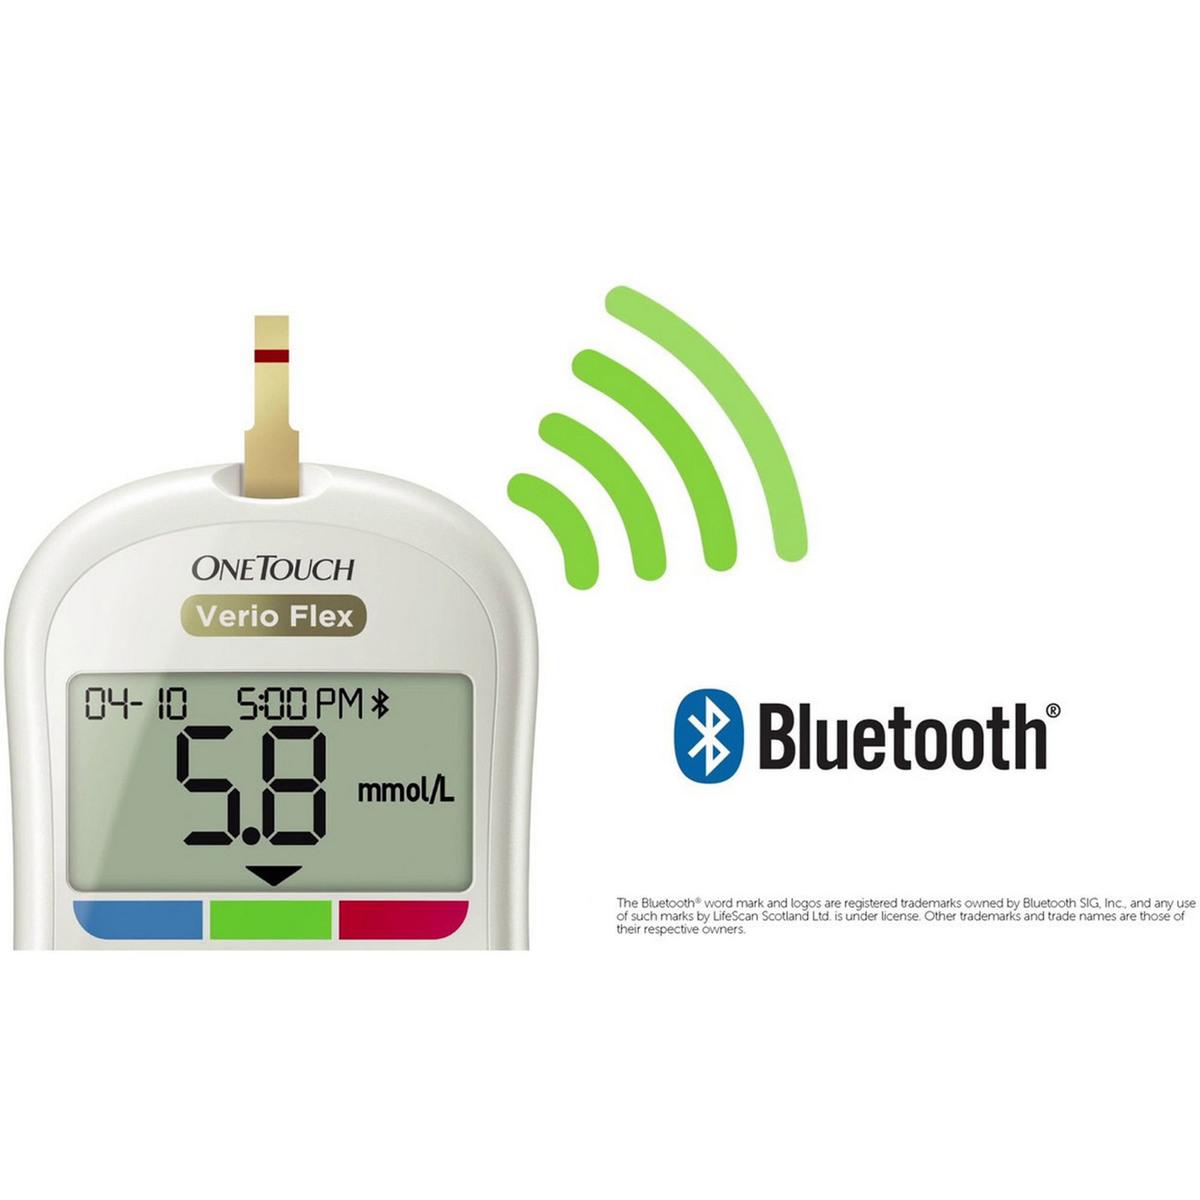 Buy One Touch Verio Flex Glucose Monitor - Glucose Monitor